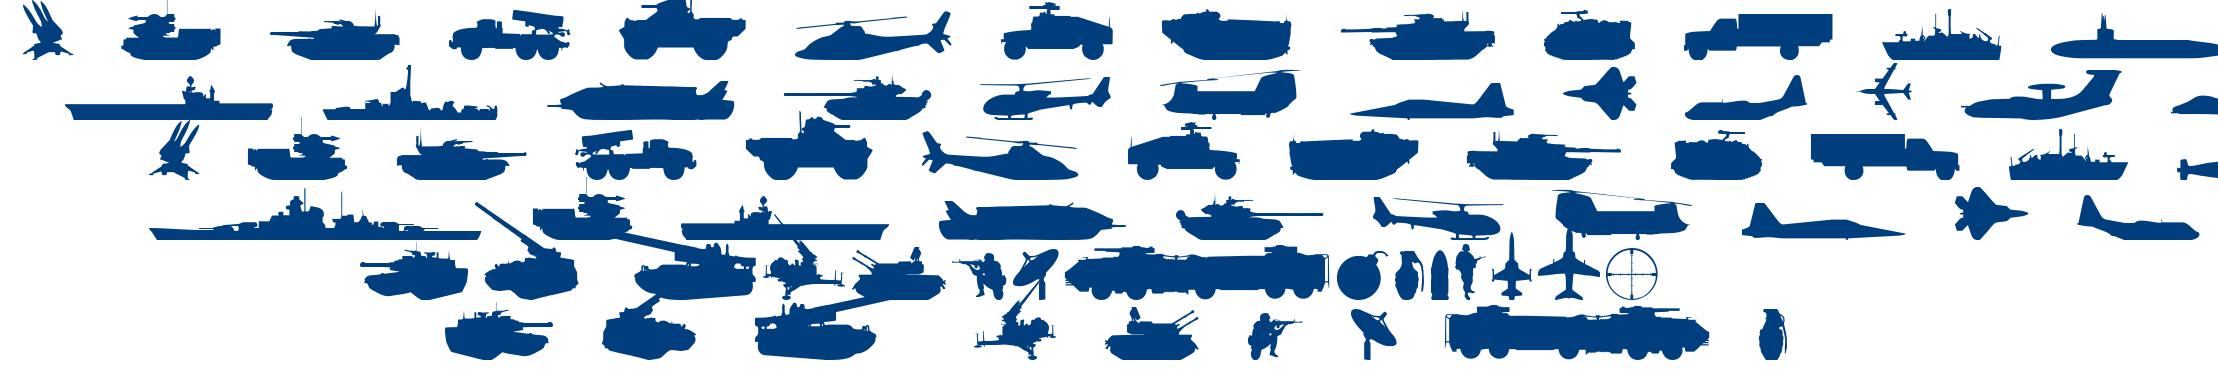 Military RPG font